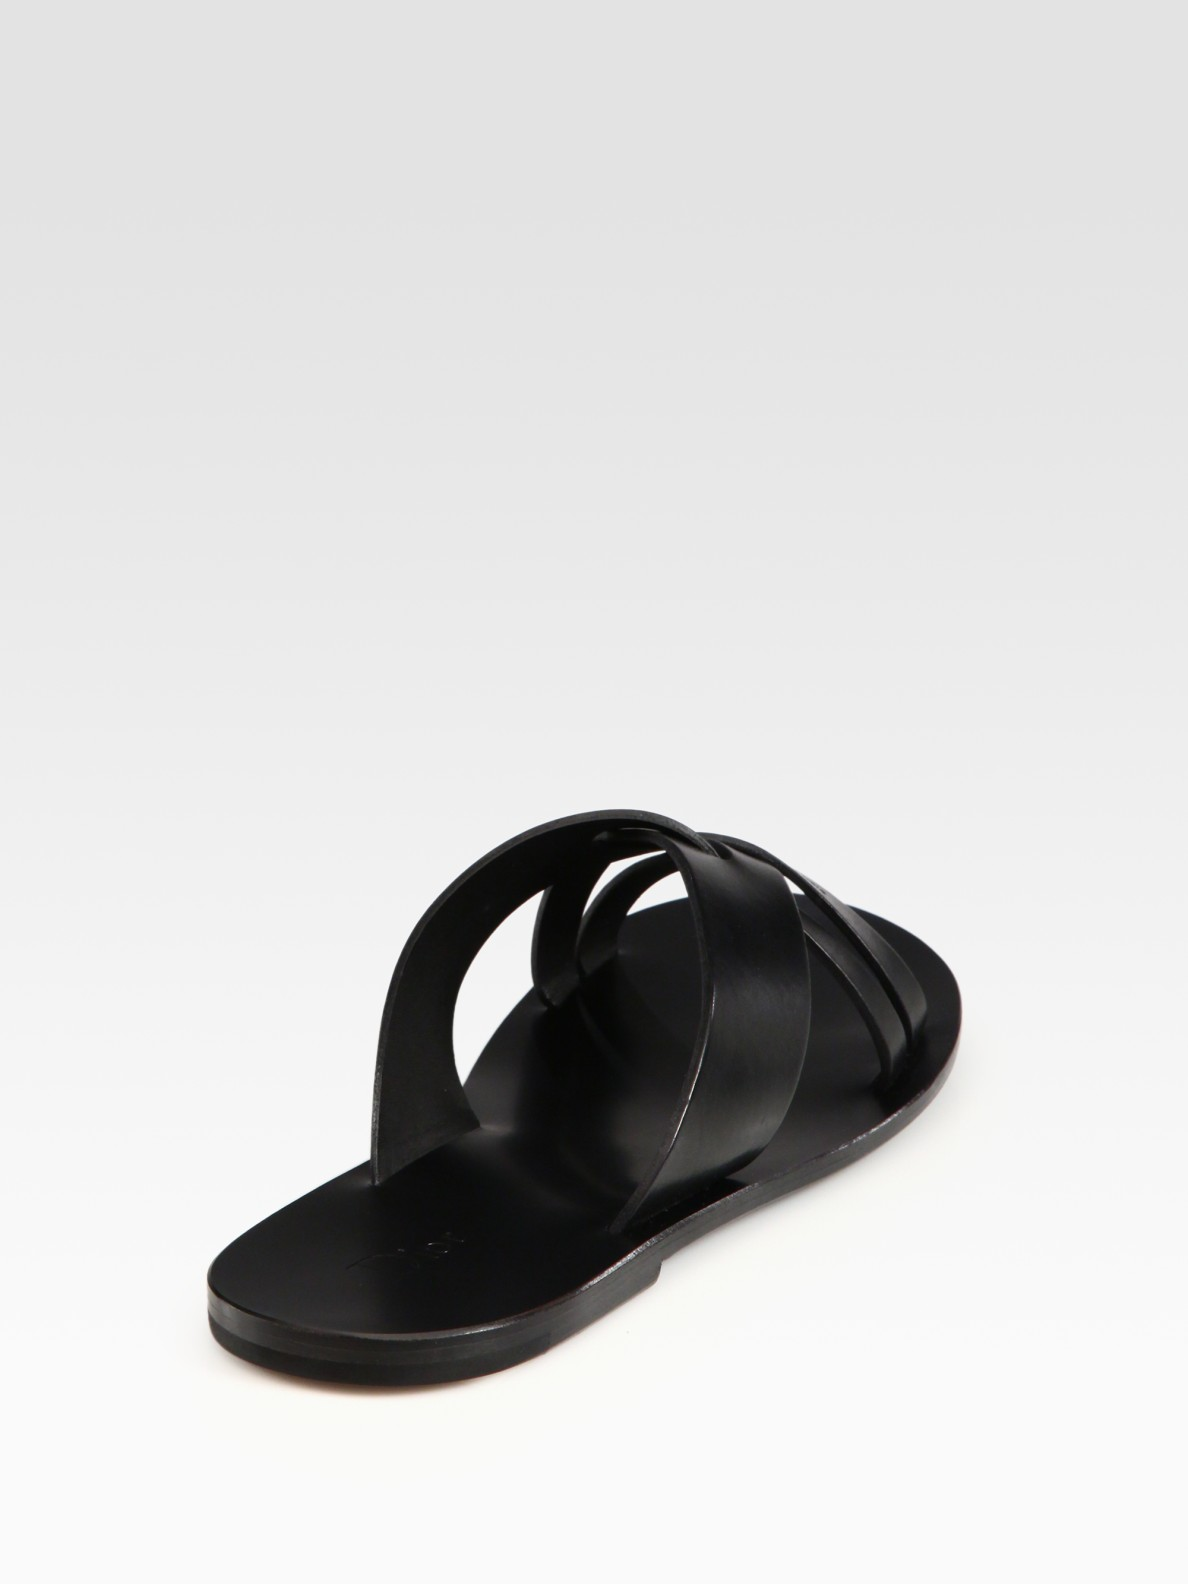 17cb2db083f Lyst - Dior Homme Leather Sandal in Black for Men